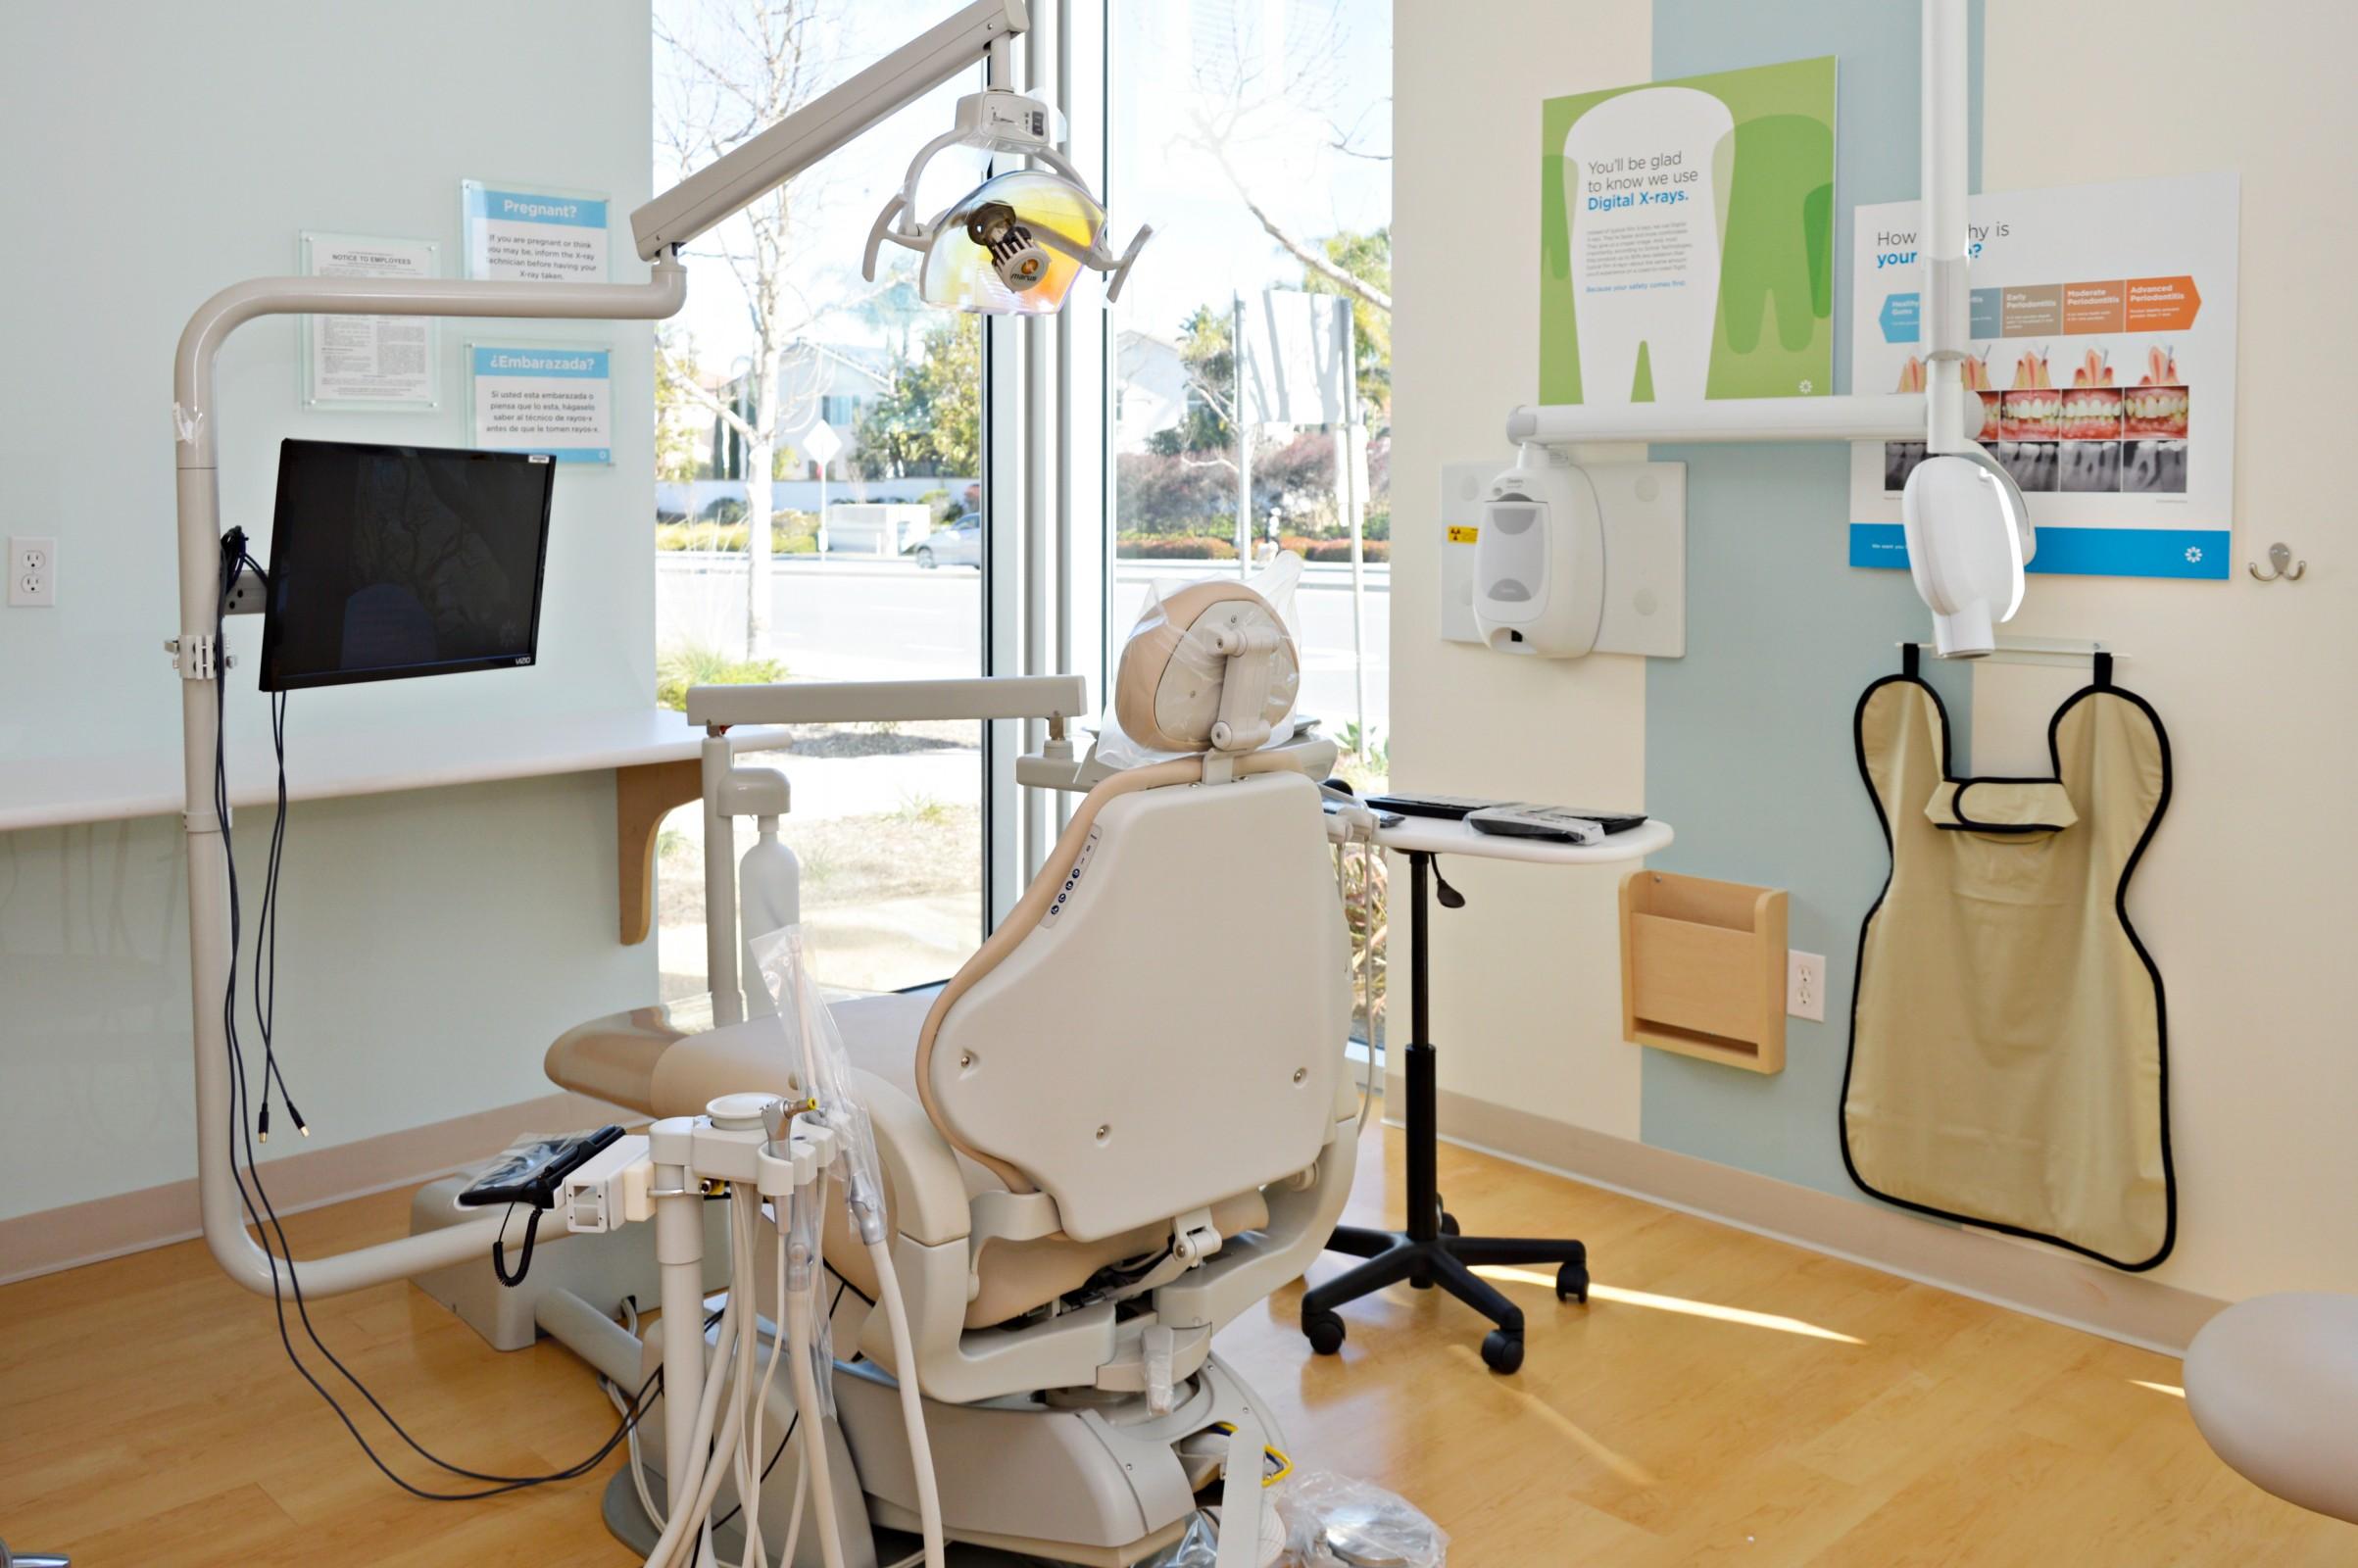 Carmel Valley Dentist Office and Orthodontics image 6